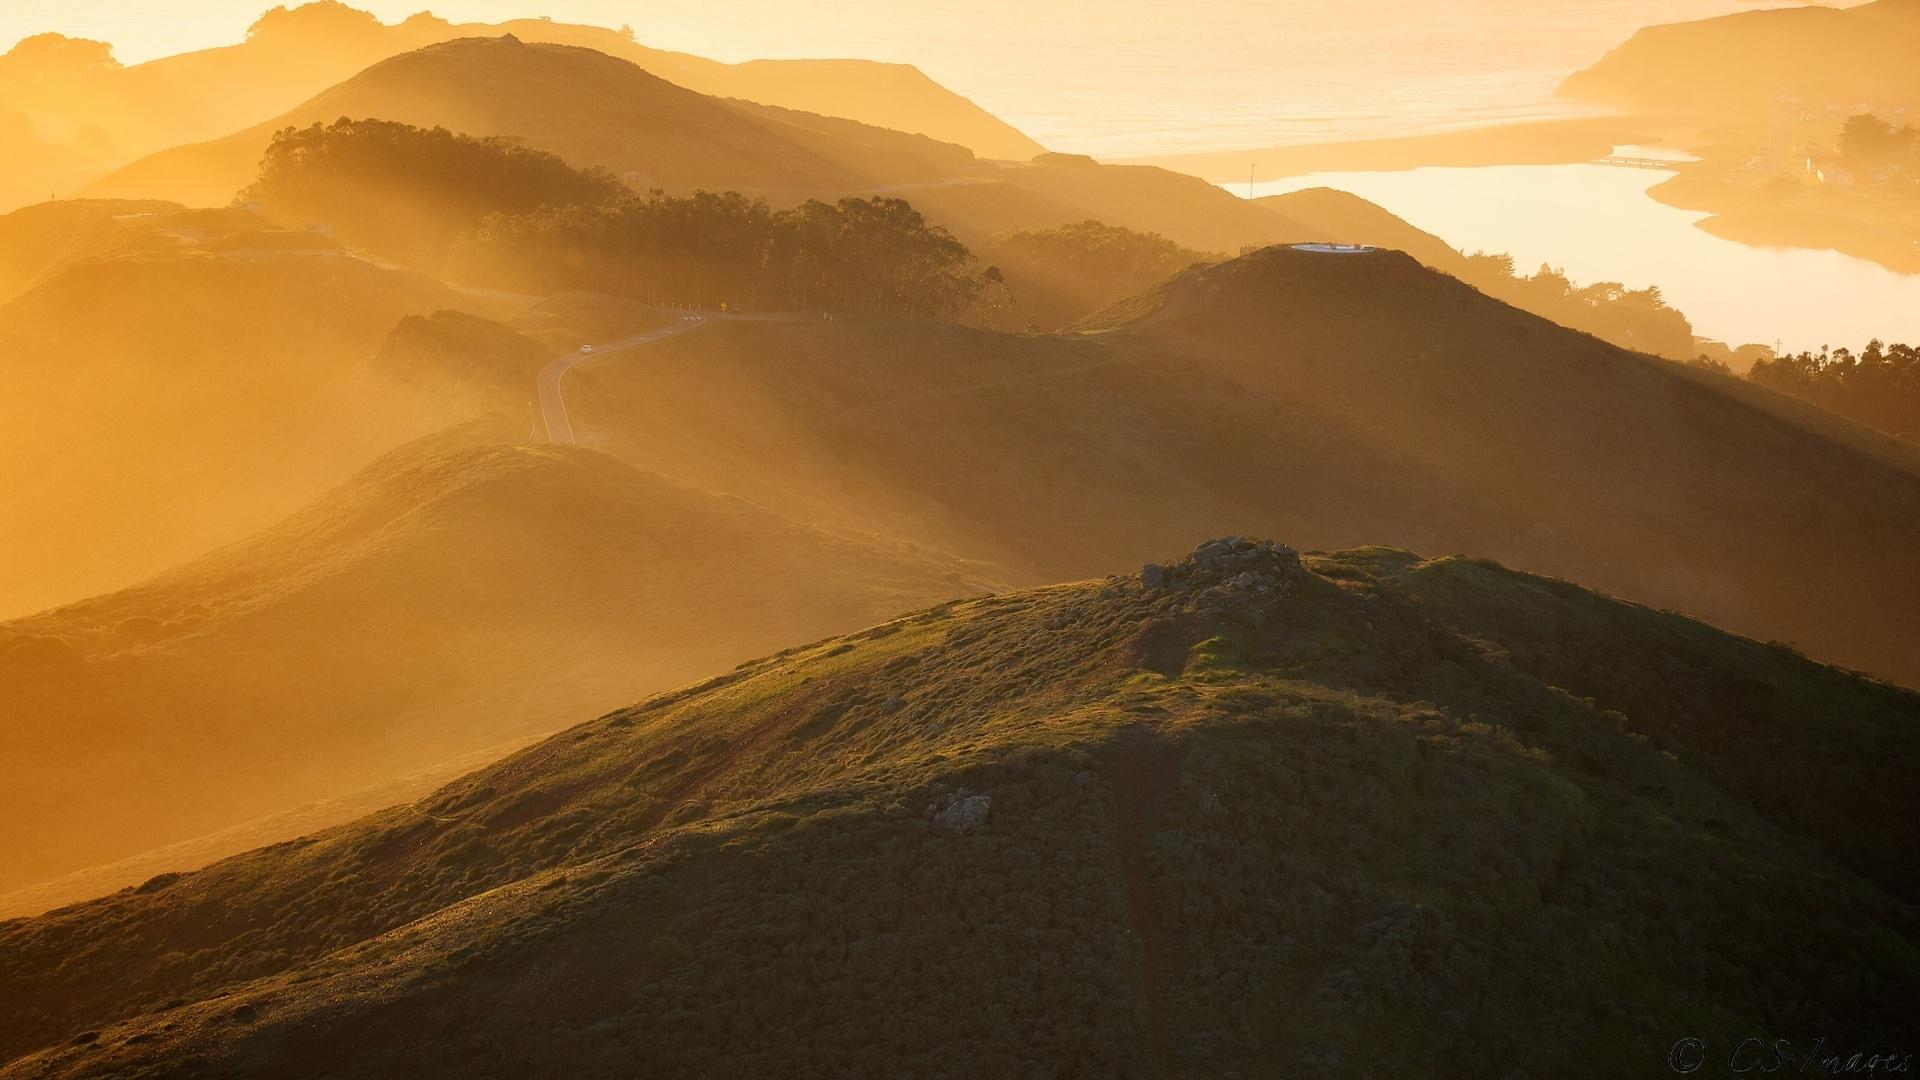 Sun Rise Free Live Wallpaper - Sunrise High Resolution Mountain , HD Wallpaper & Backgrounds